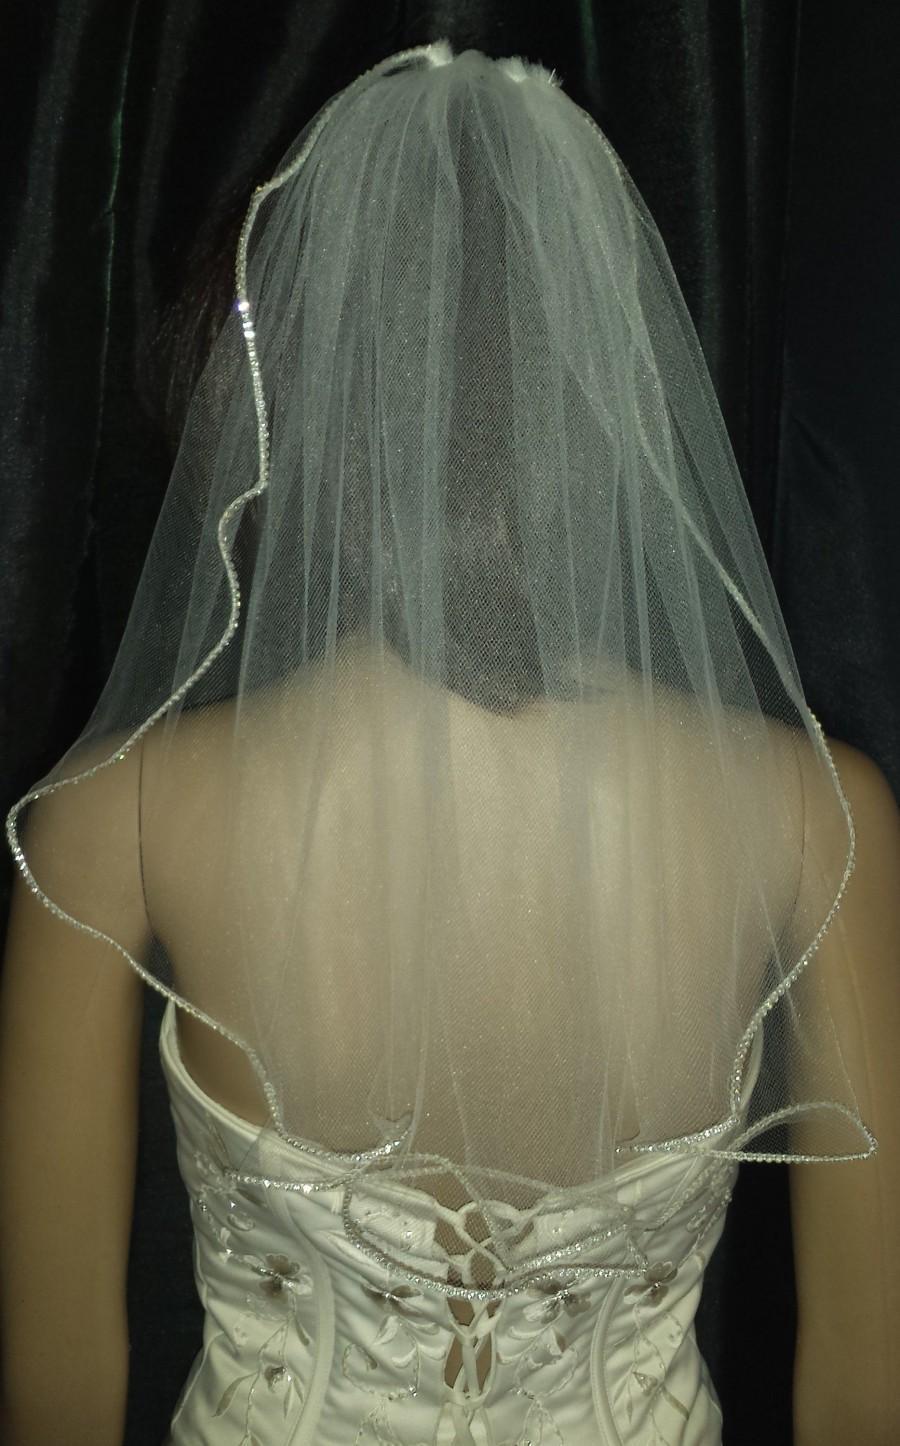 "Wedding - Hen party veil Diamante Rhinestone edged wedding veil 1 Tier 20"" length. Brides up do hair. Other colour's white, Pale Ivory FREE UK POSTAGE"